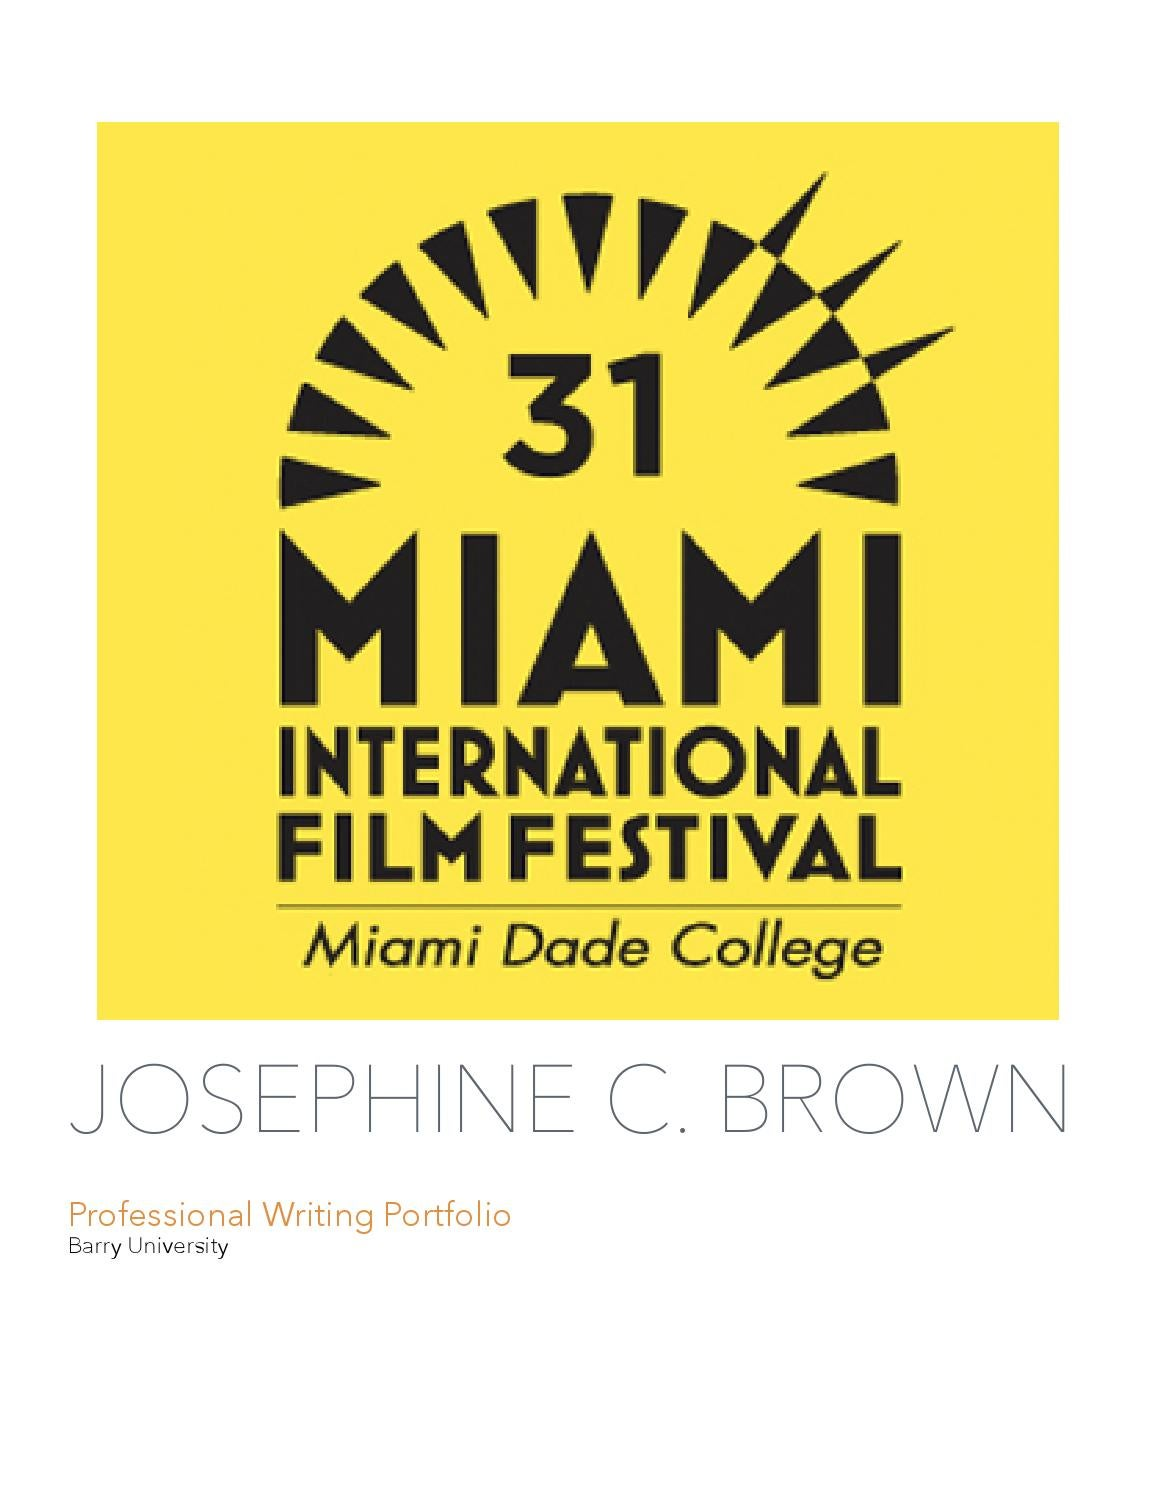 Josephine Brown's Professional Writing Portfolio by Josie